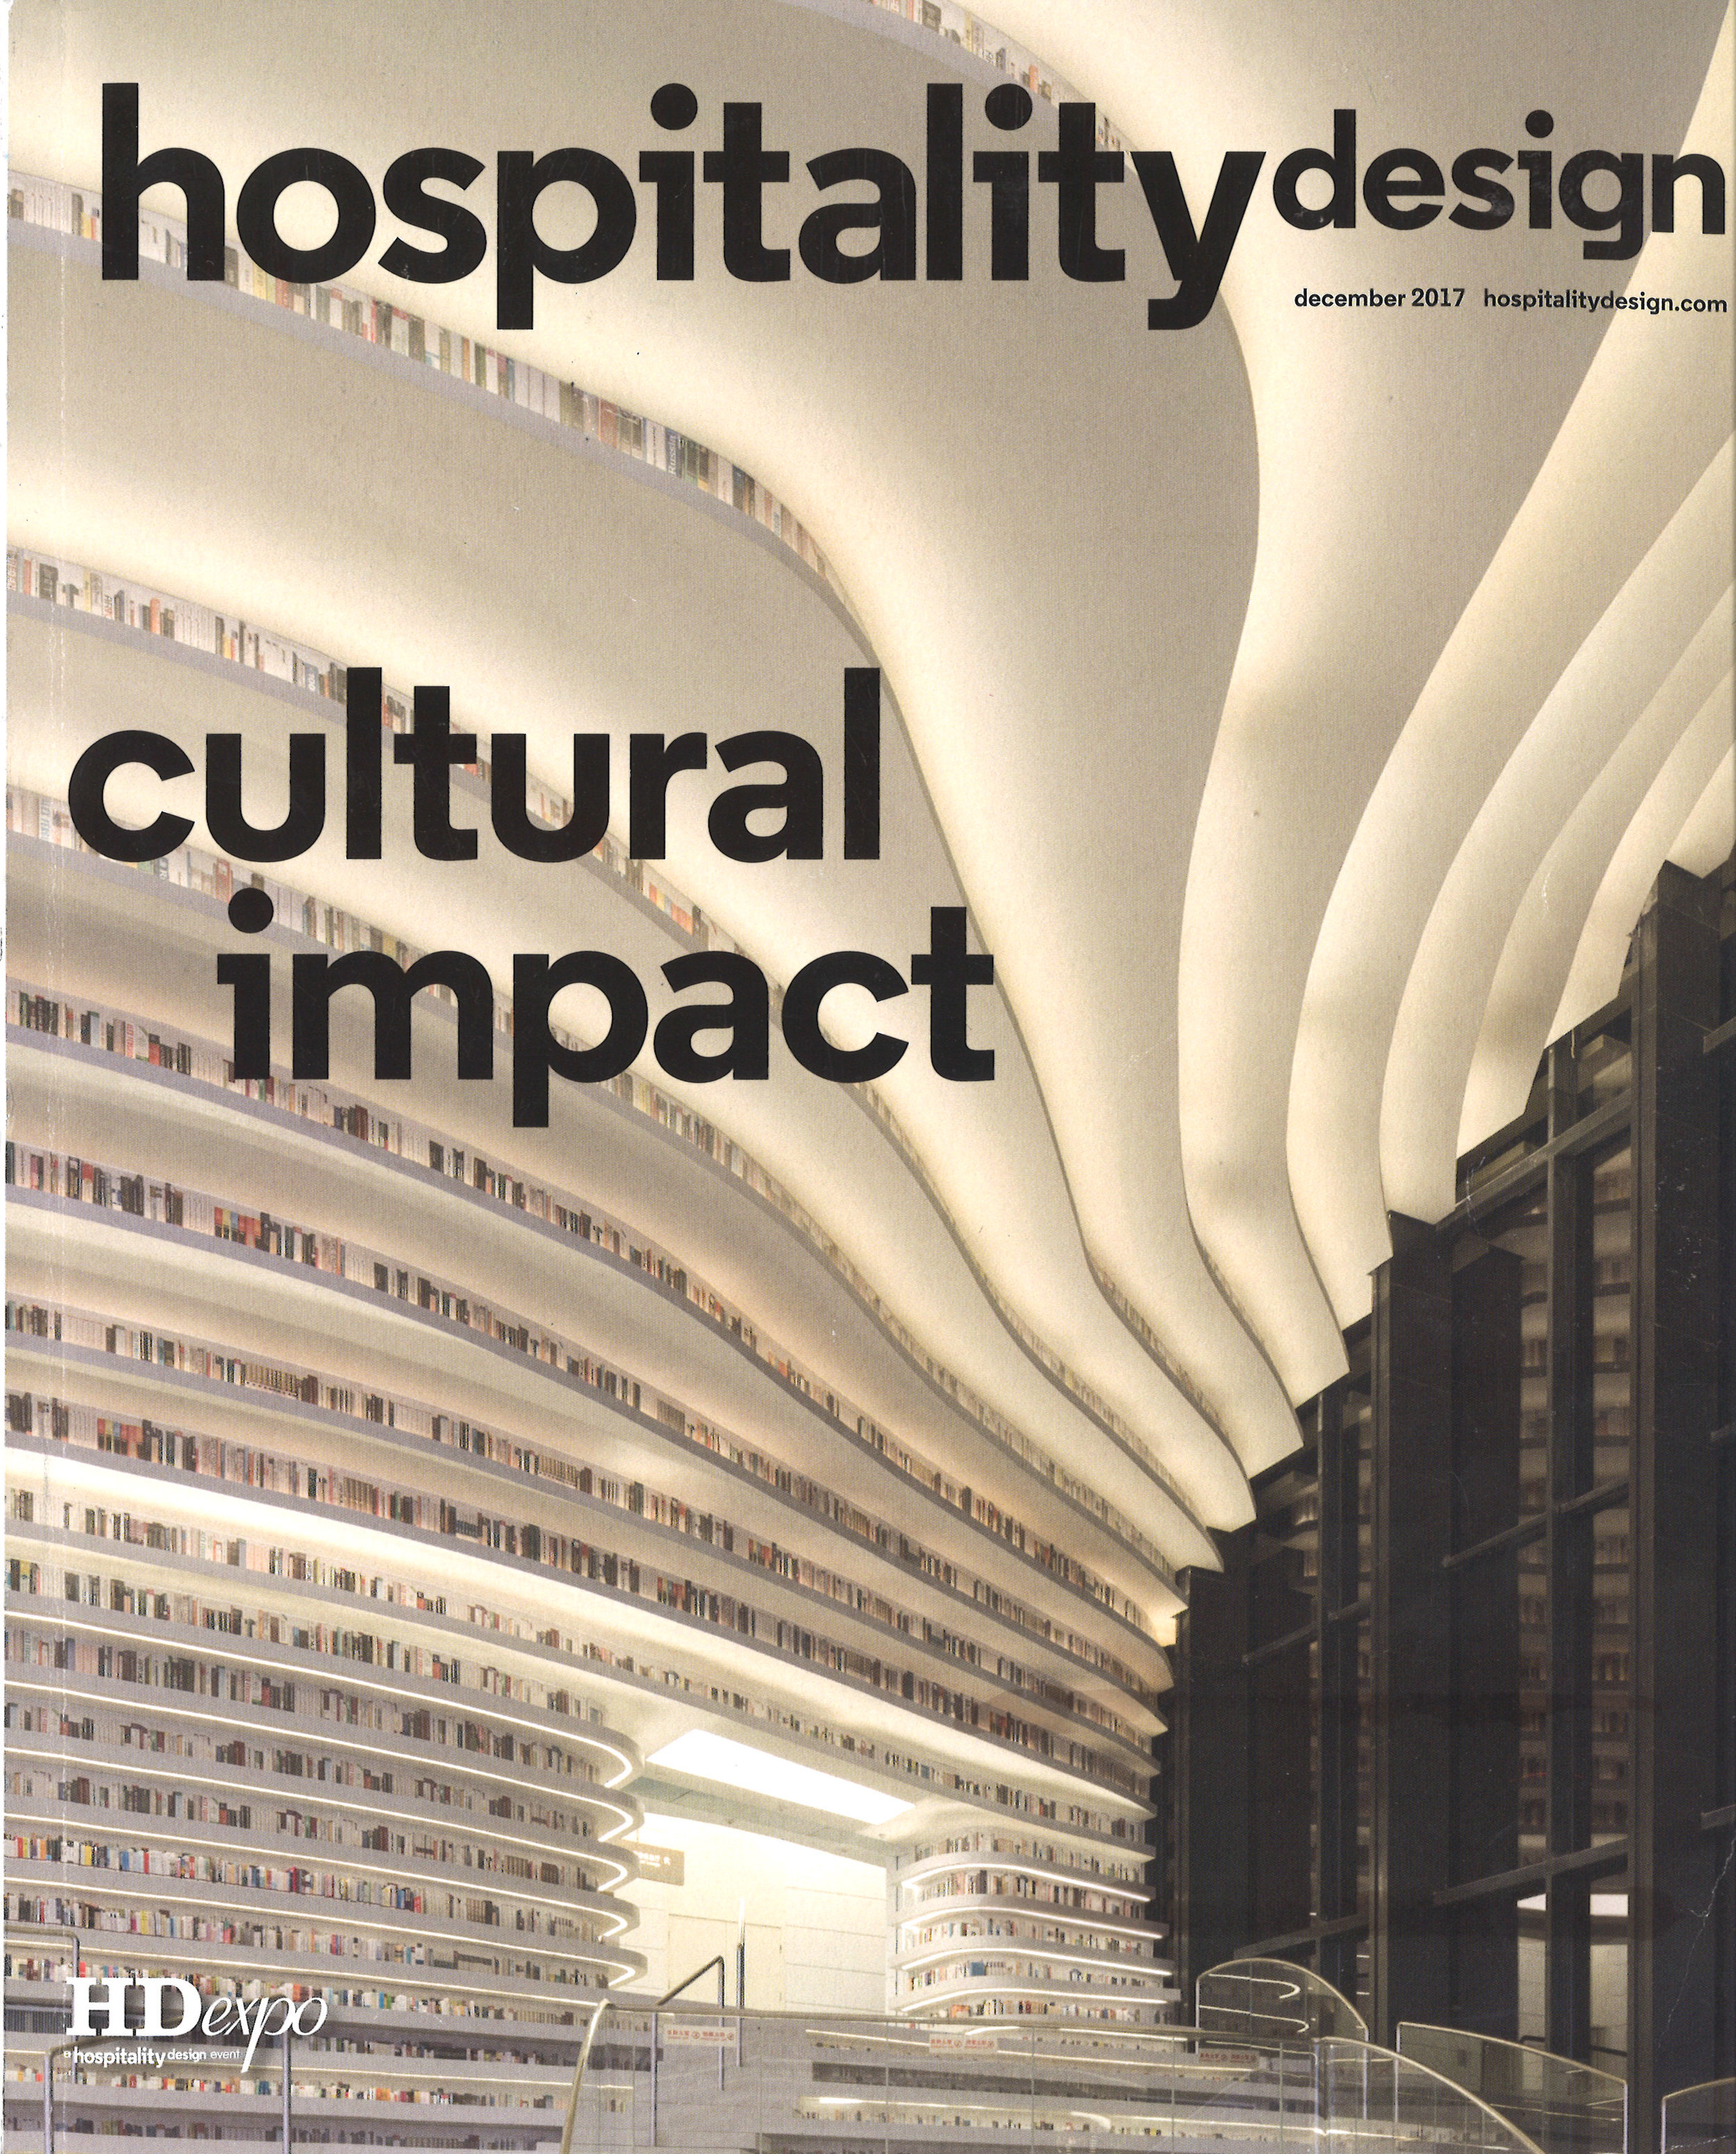 Hospitality Design Magazine December 2017 cover